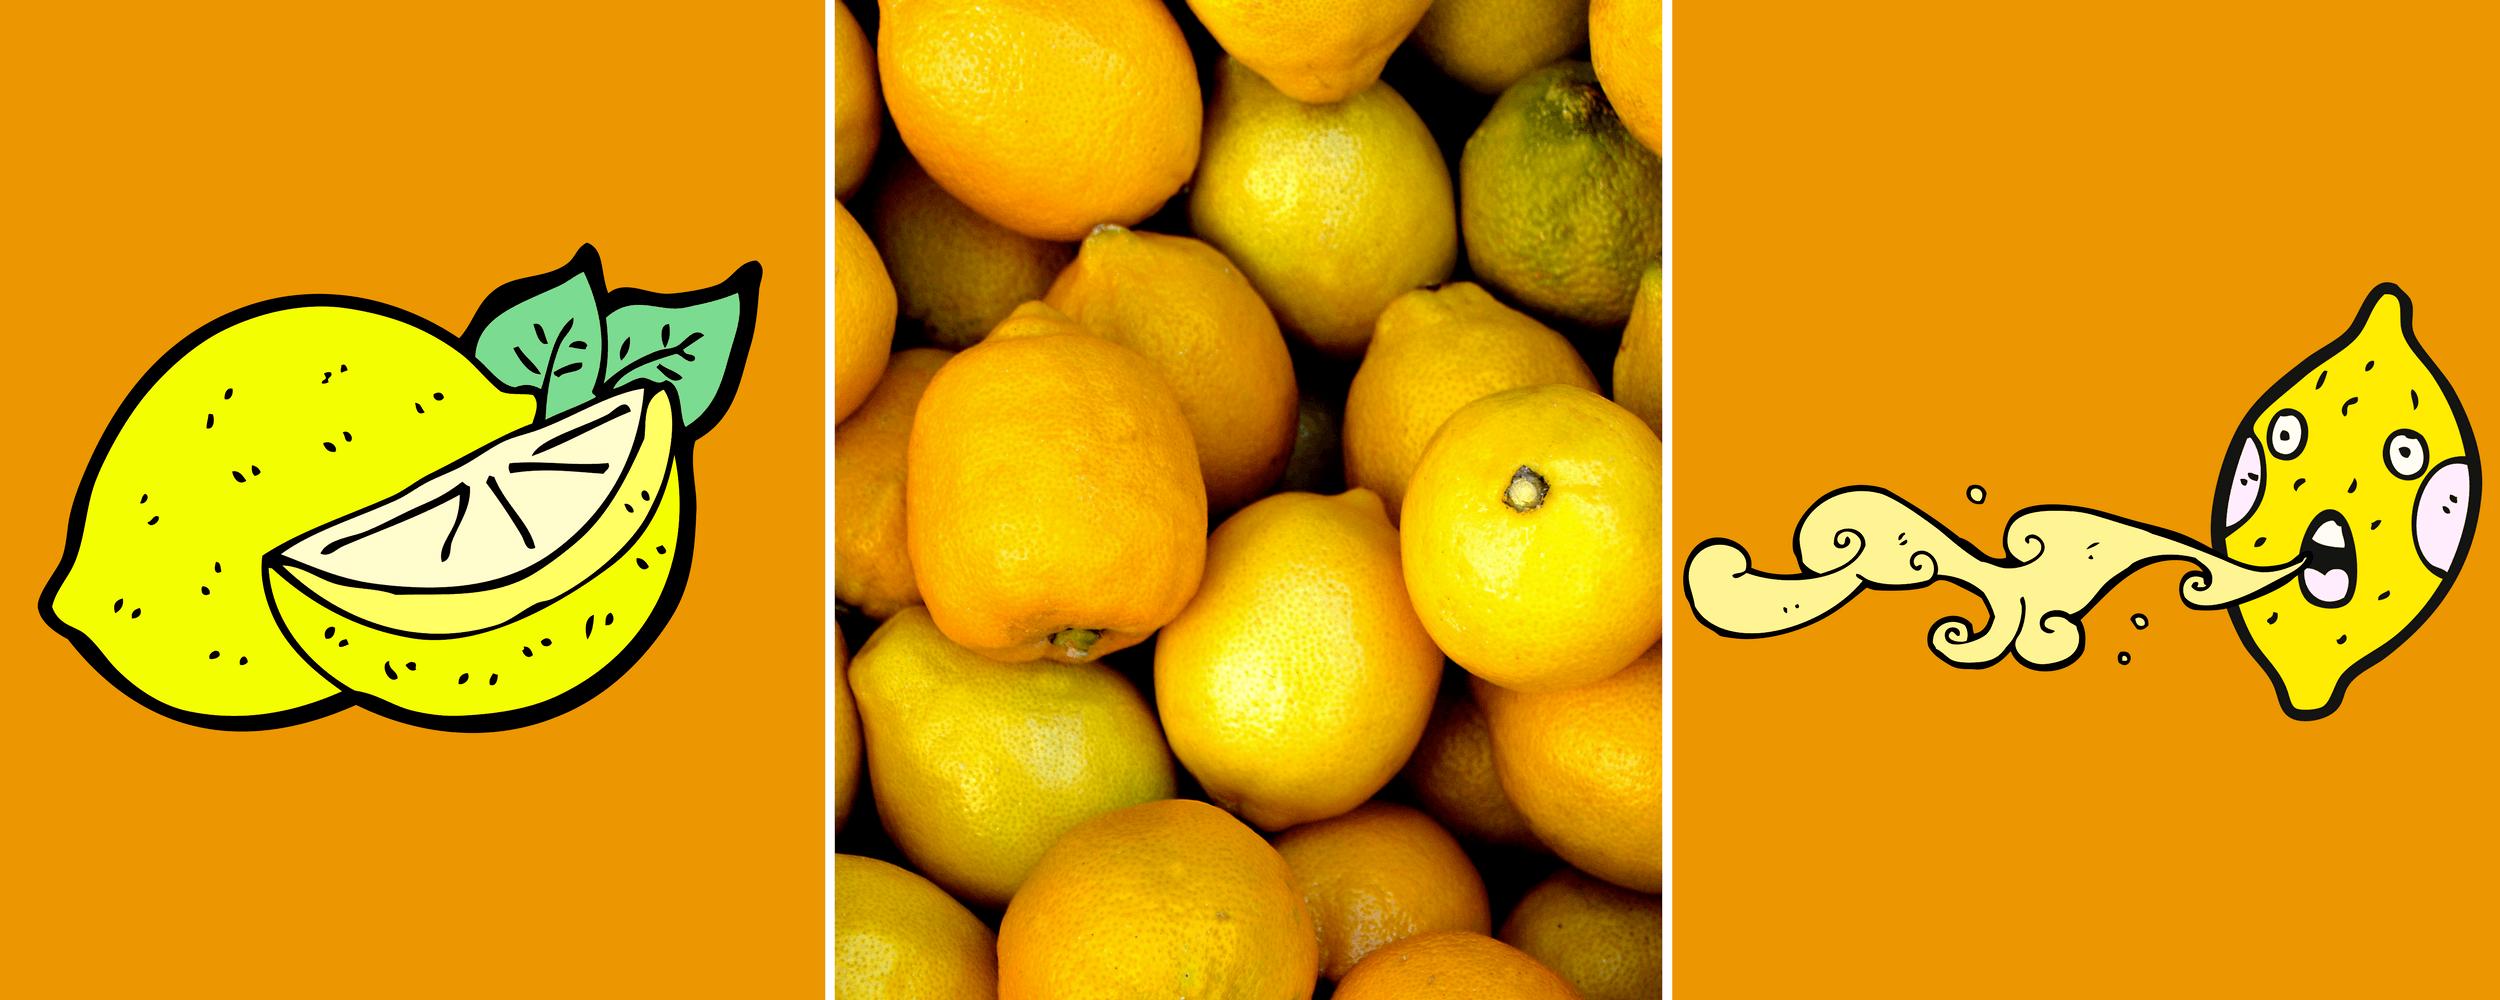 Happy birthday marketing lemons from LongHorn